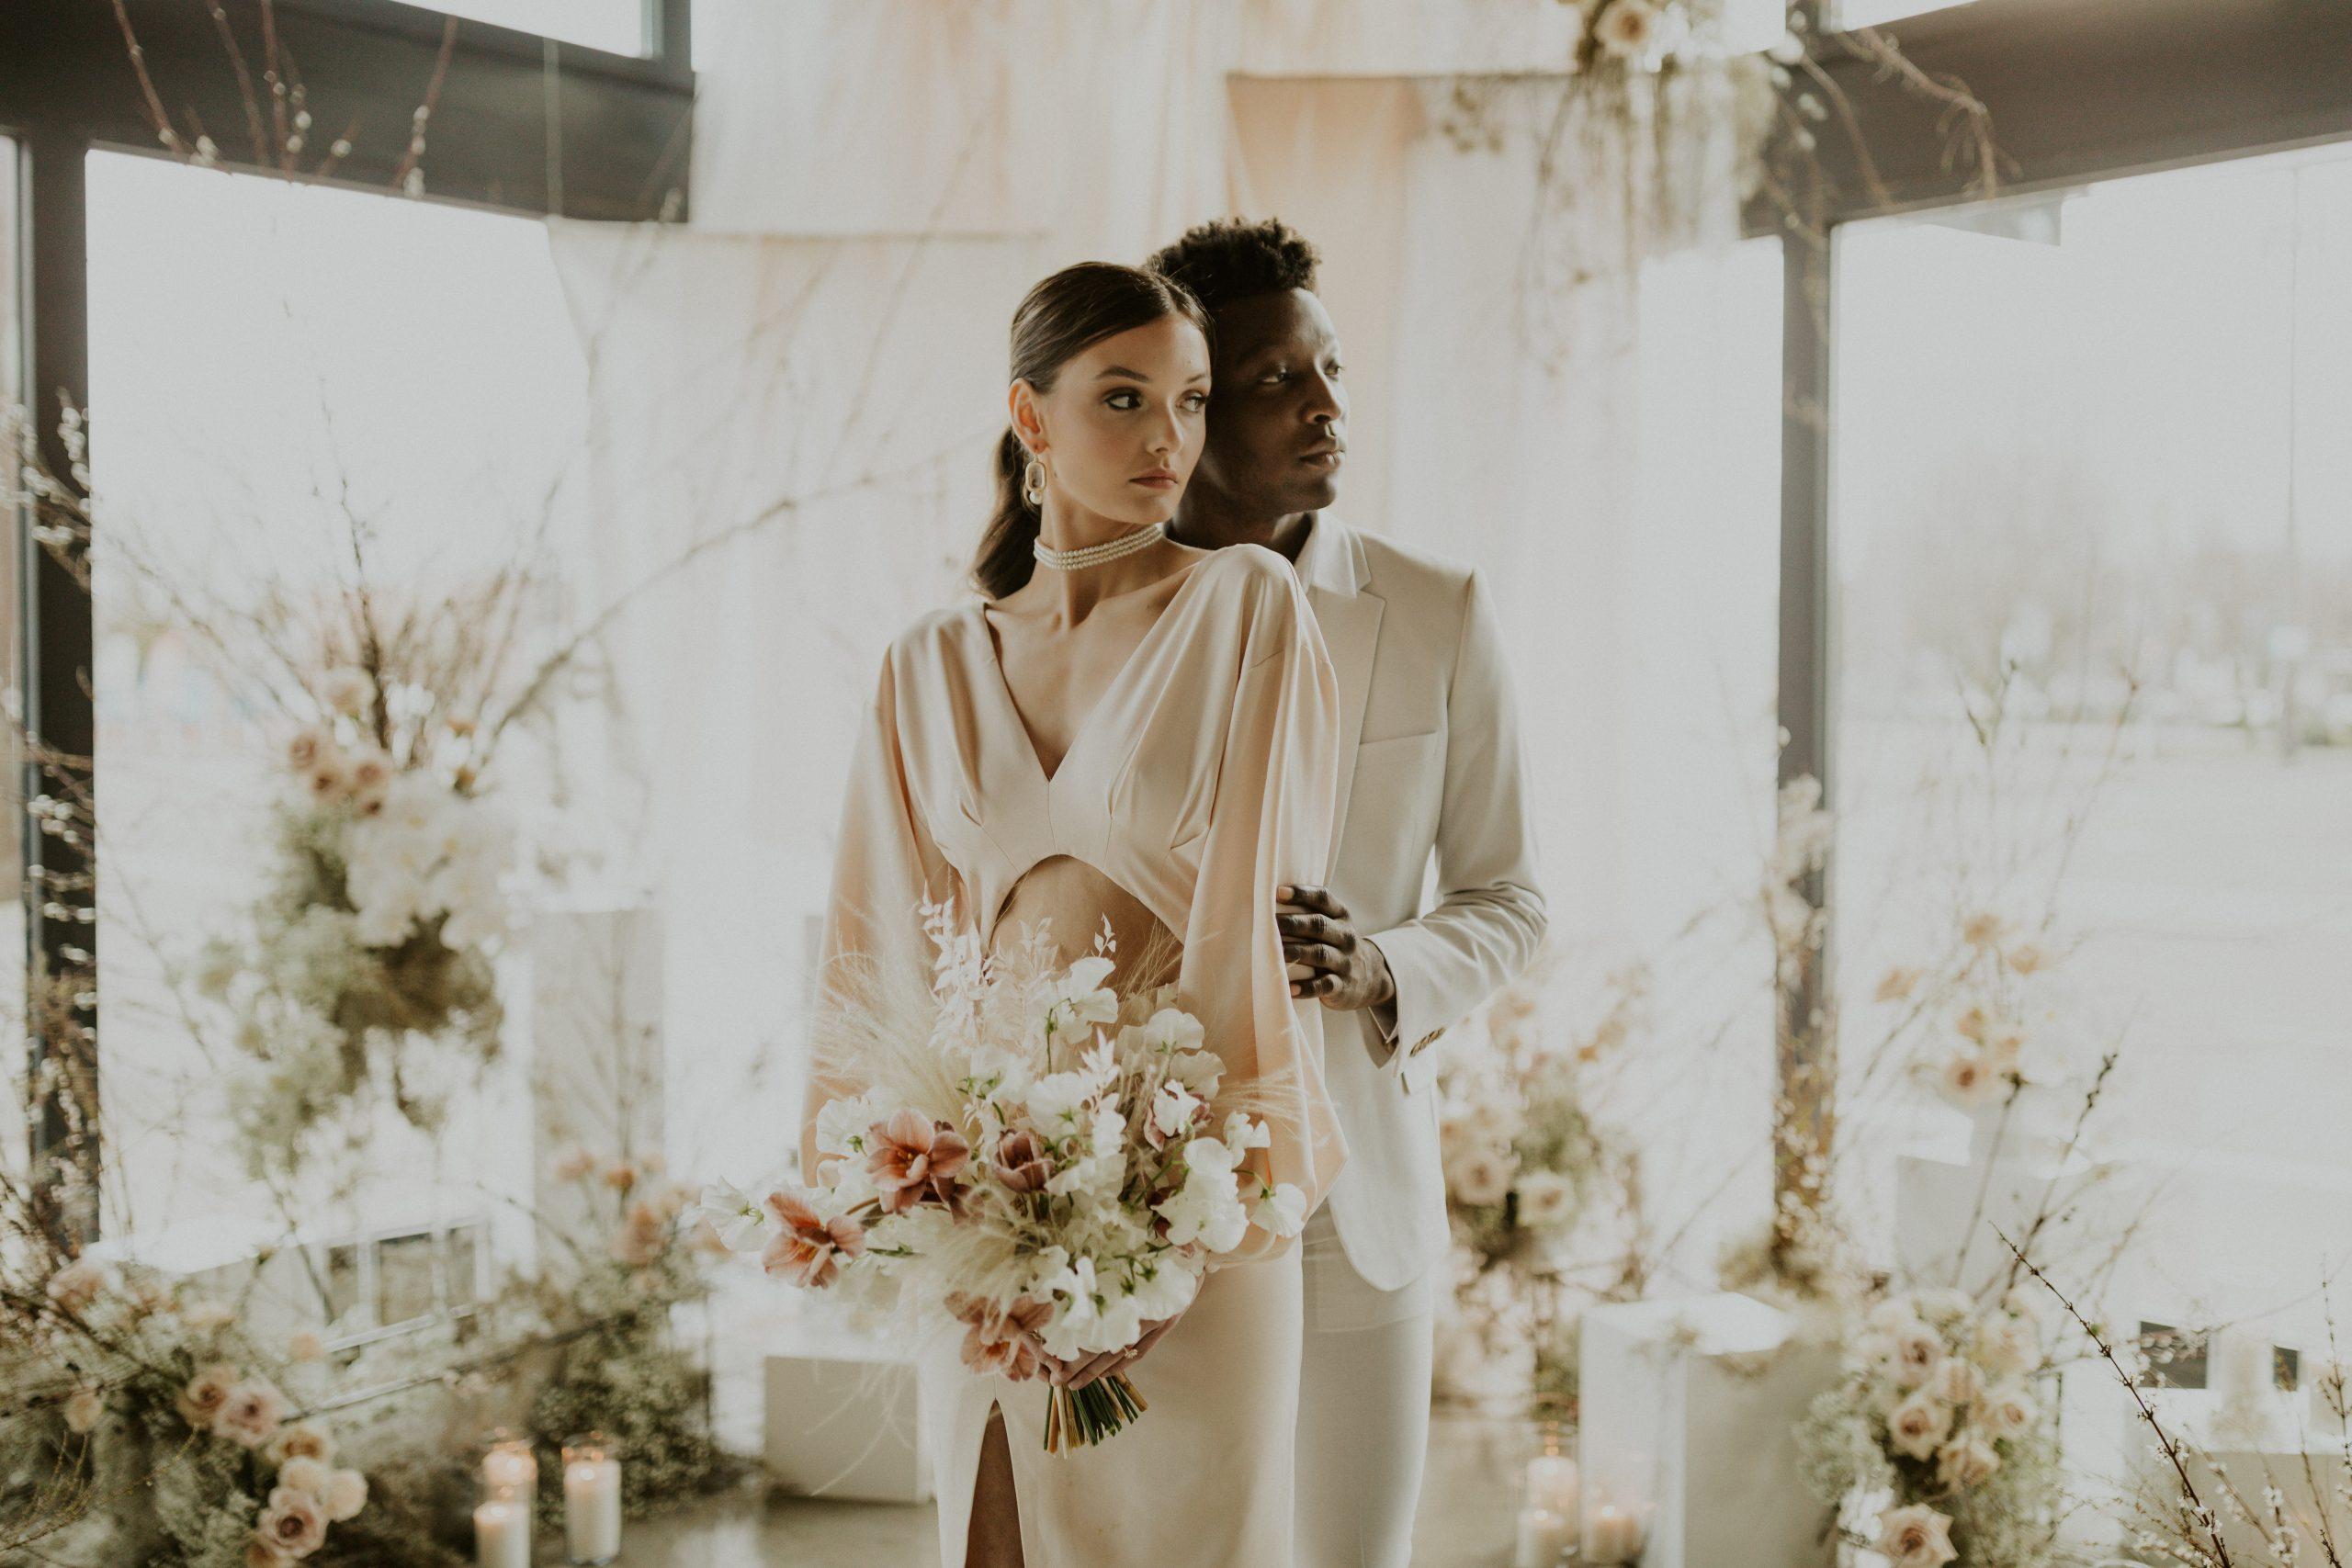 ali-rae-photography-modern-luxury-easton-broad-elopement-portland-oregon